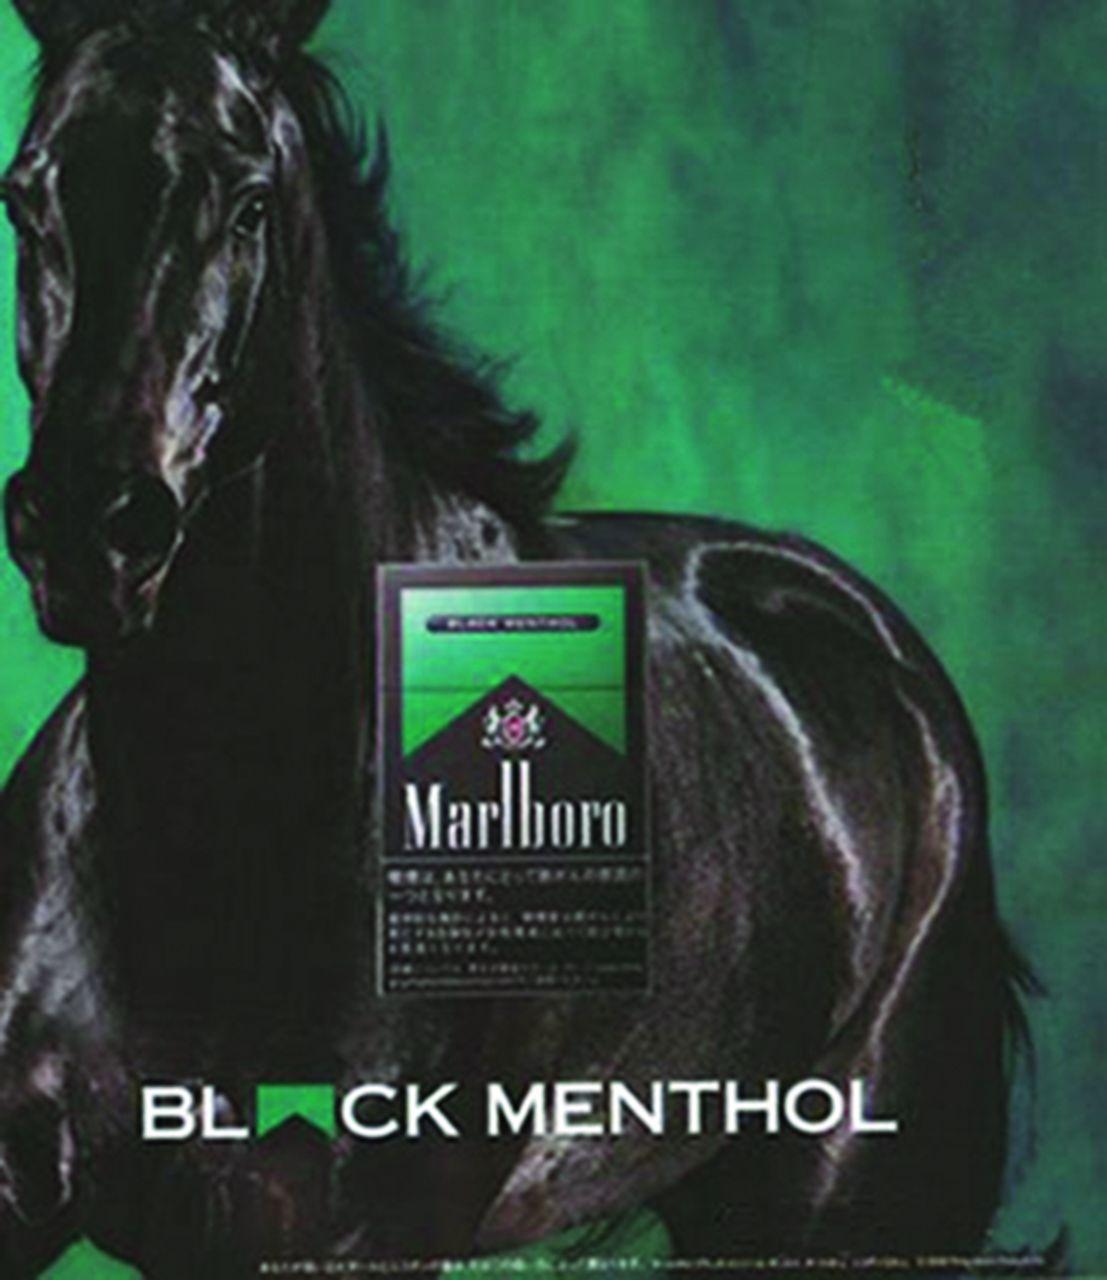 Buy Viceroy Virginia blend cigarettes